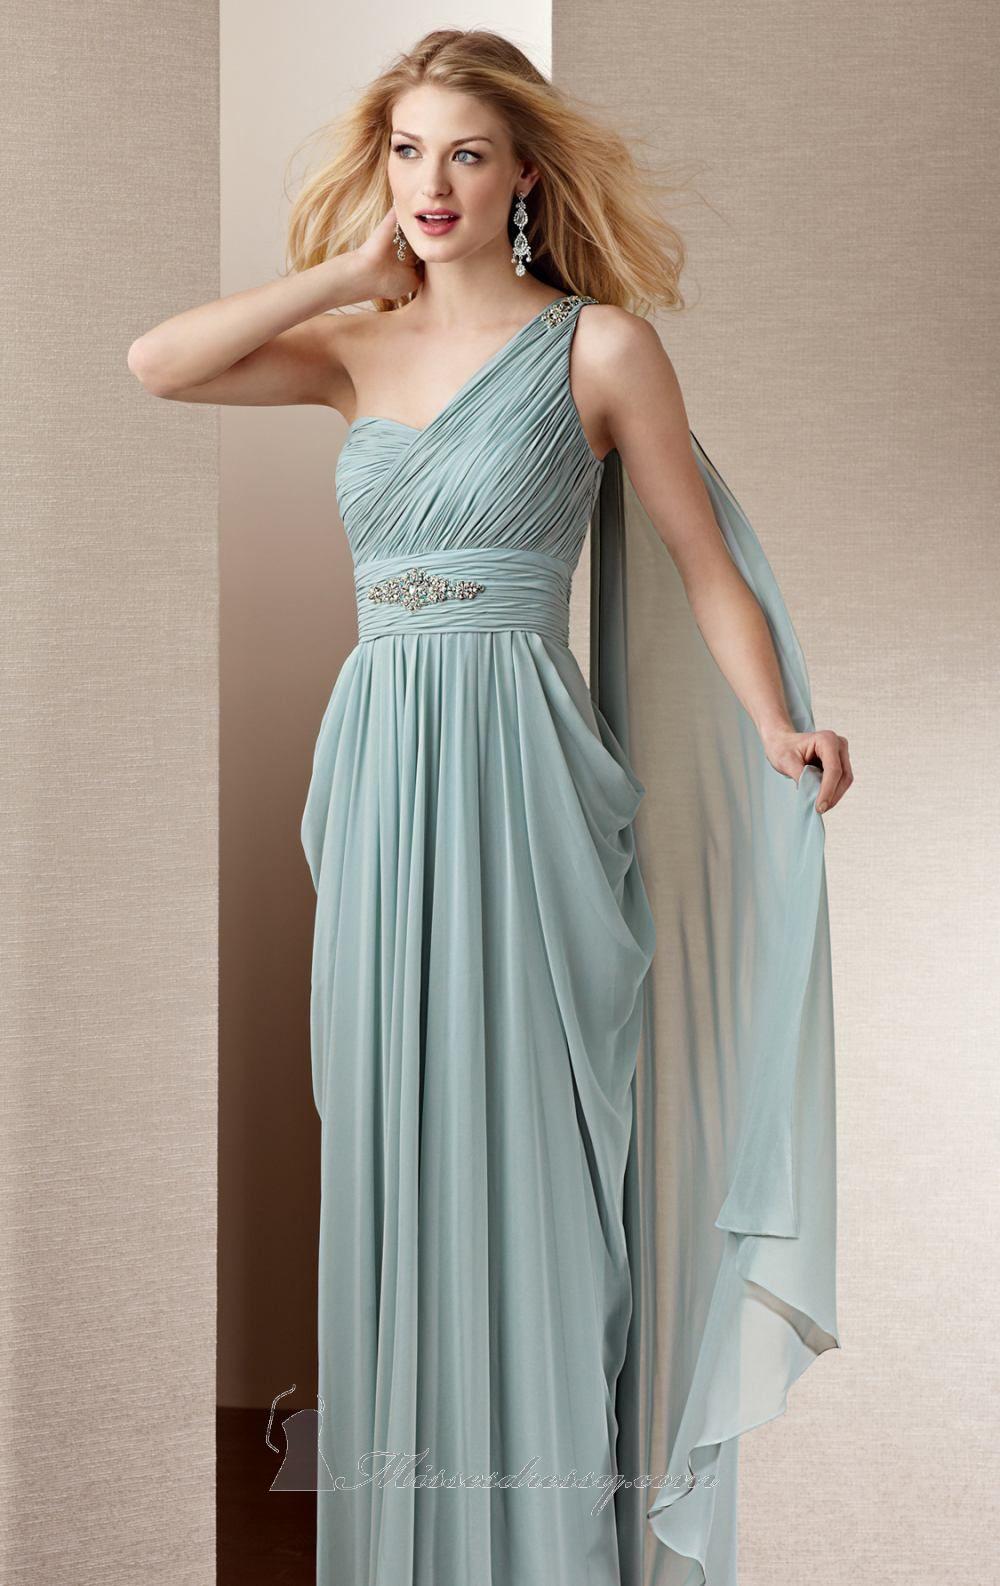 Charming Online Bridesmaid Dresses Uk Photos - Wedding Ideas ...